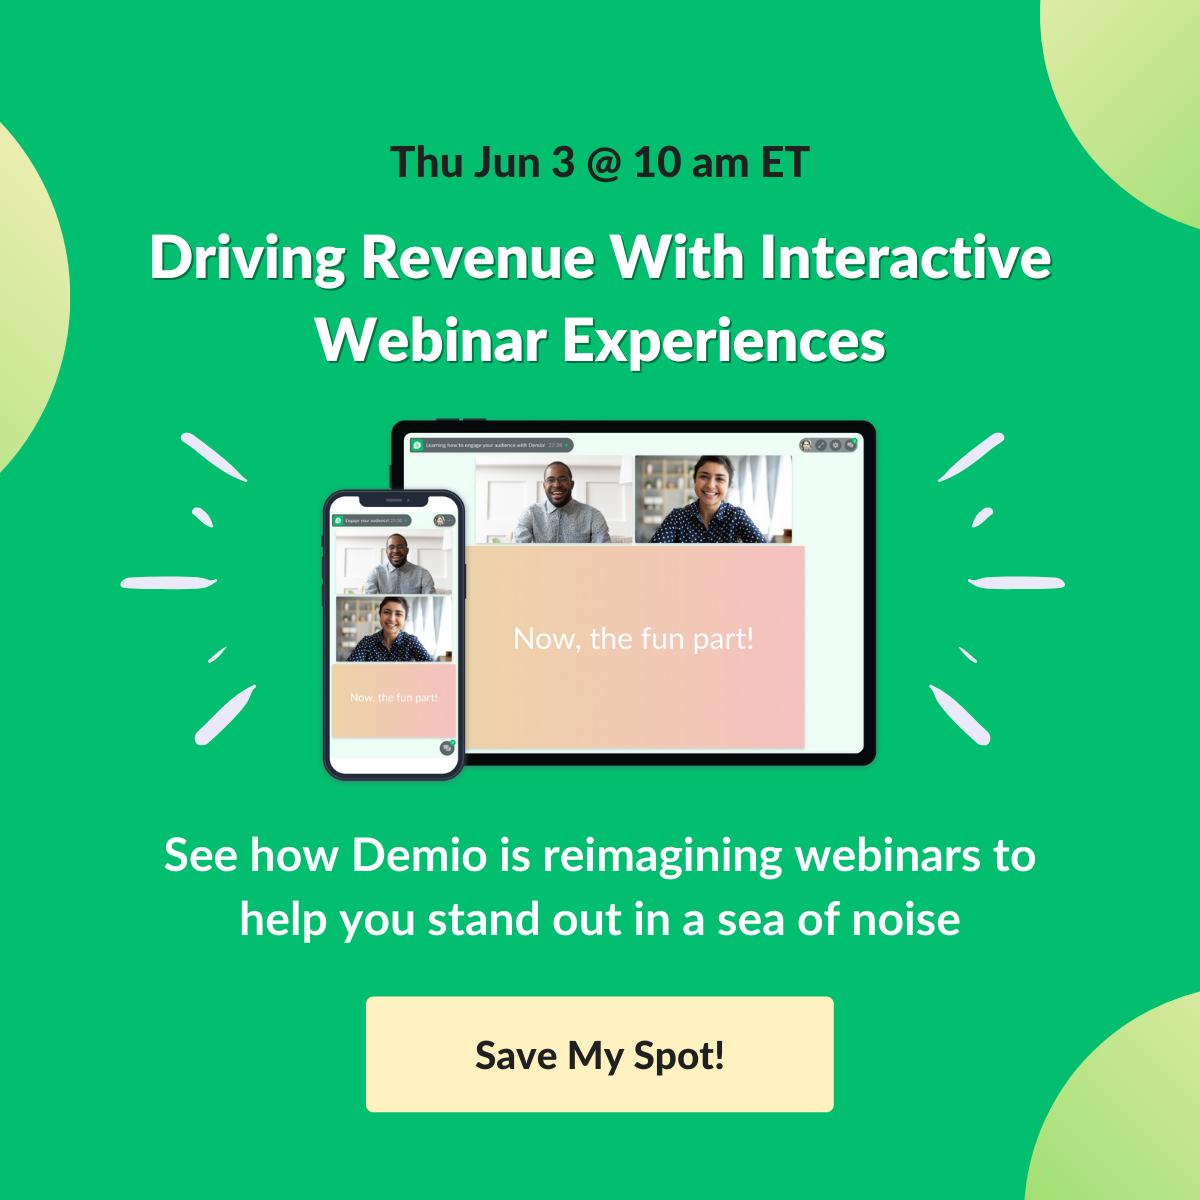 Webinar invite: driving revenue with interactive webinar experiences.